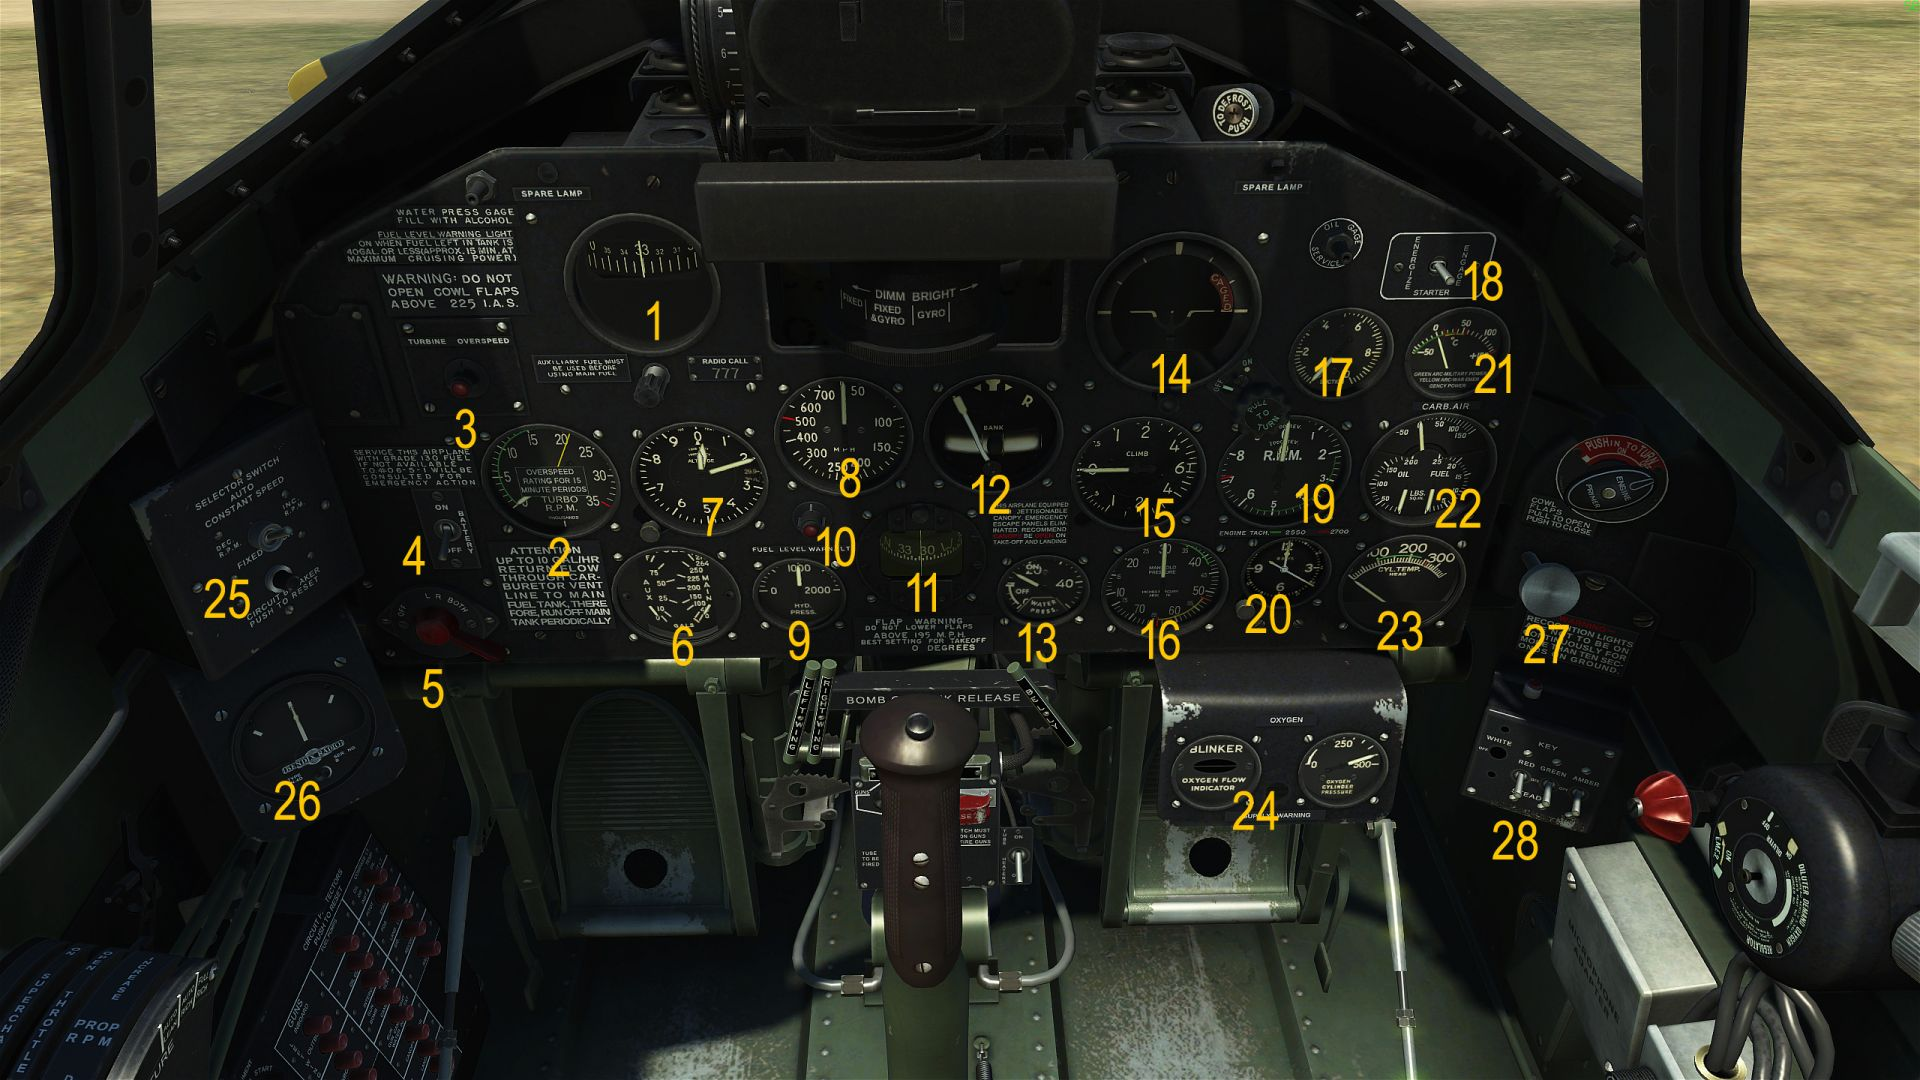 [FICHE] Republic P47-D-28-RE 5bdab251b2dad